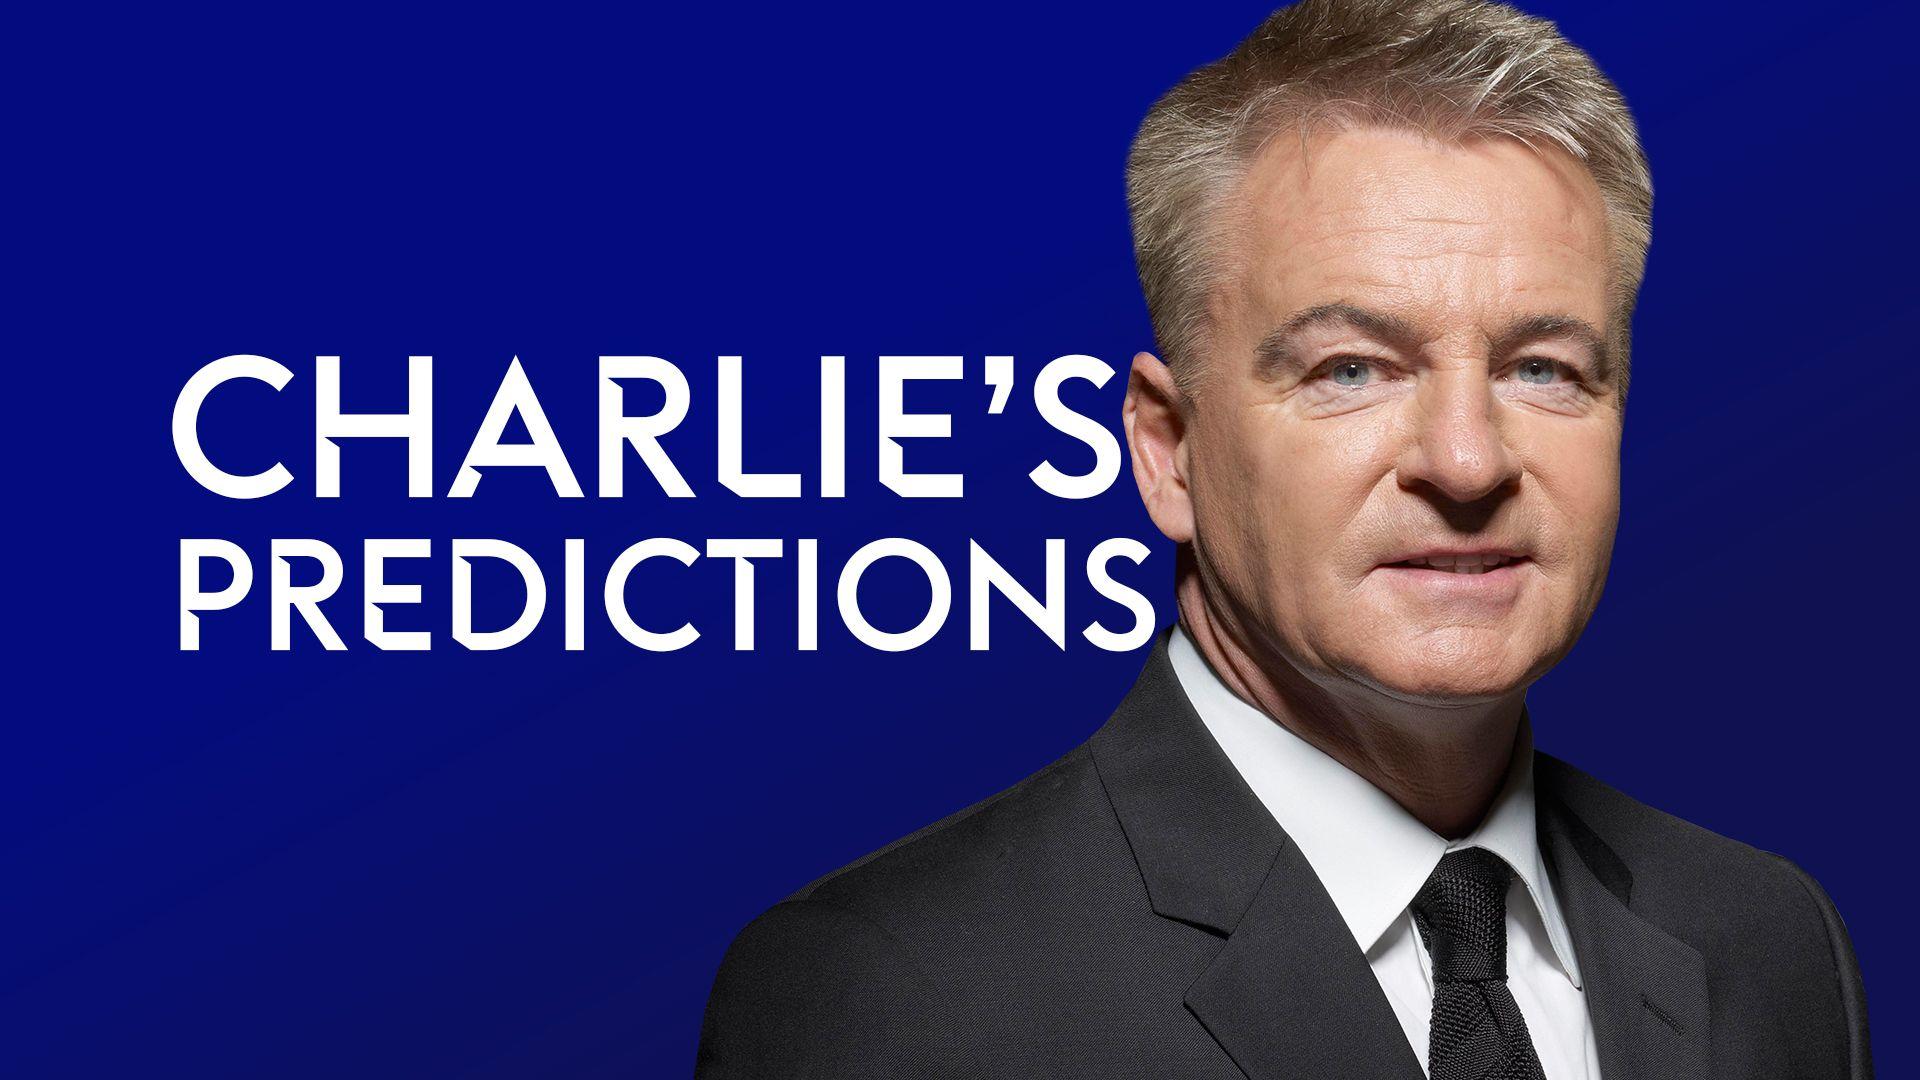 Charlie's European predictions